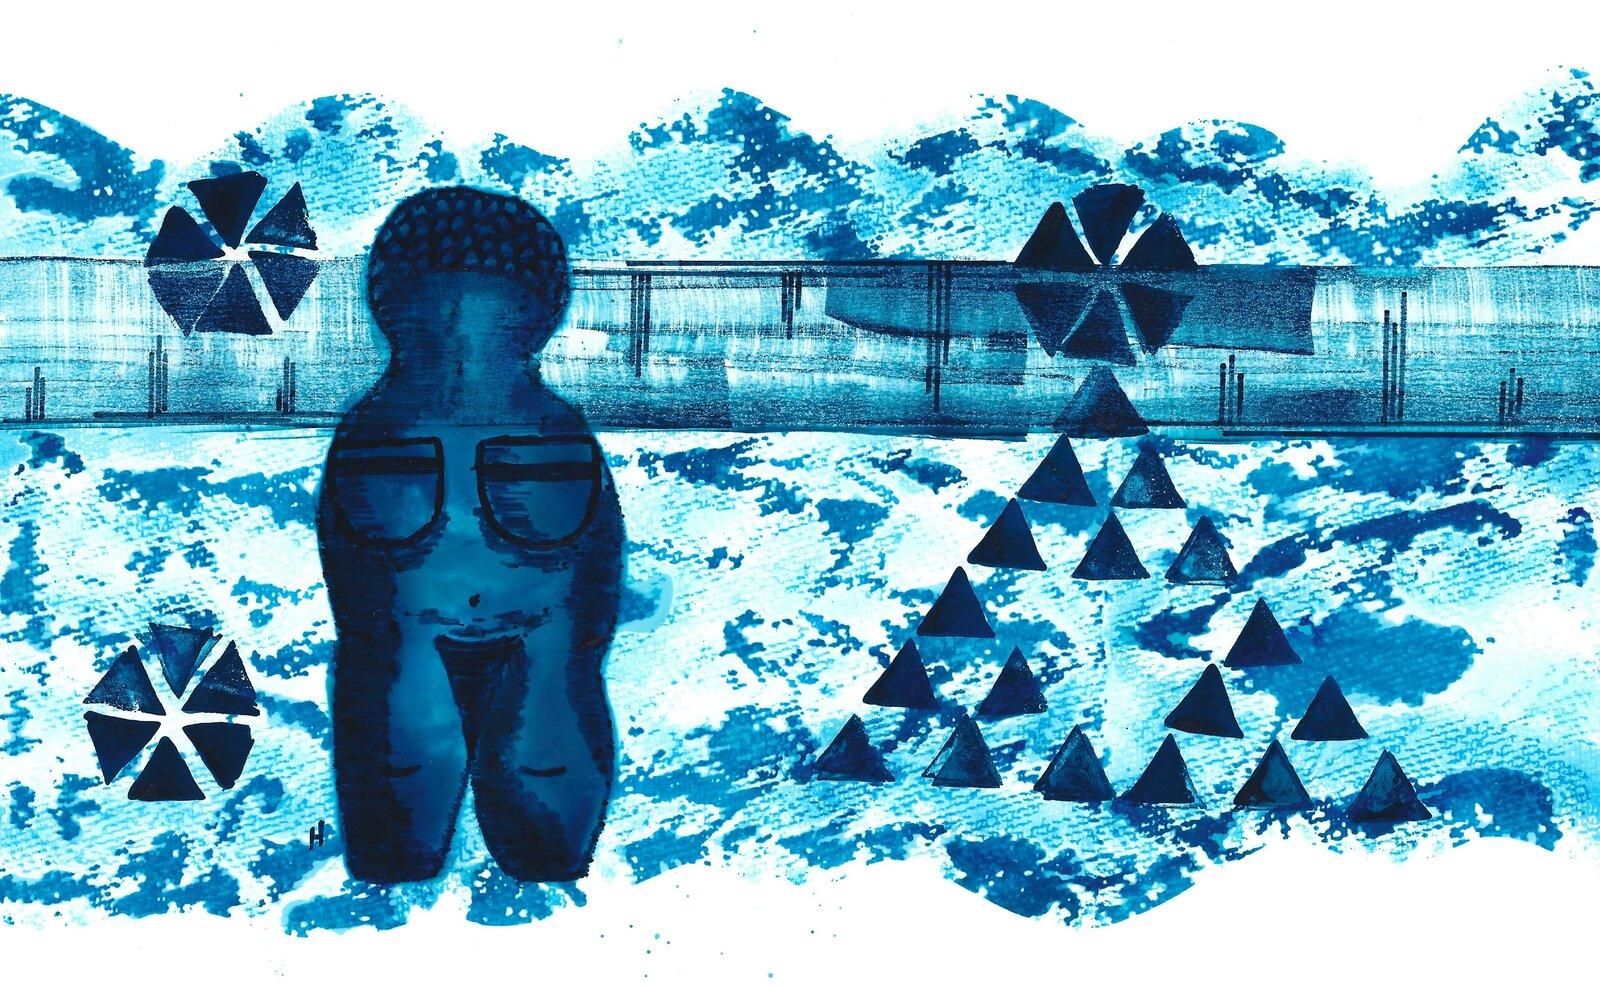 jacques herbin - bleu austral - inkxperiment 300ppi.jpeg